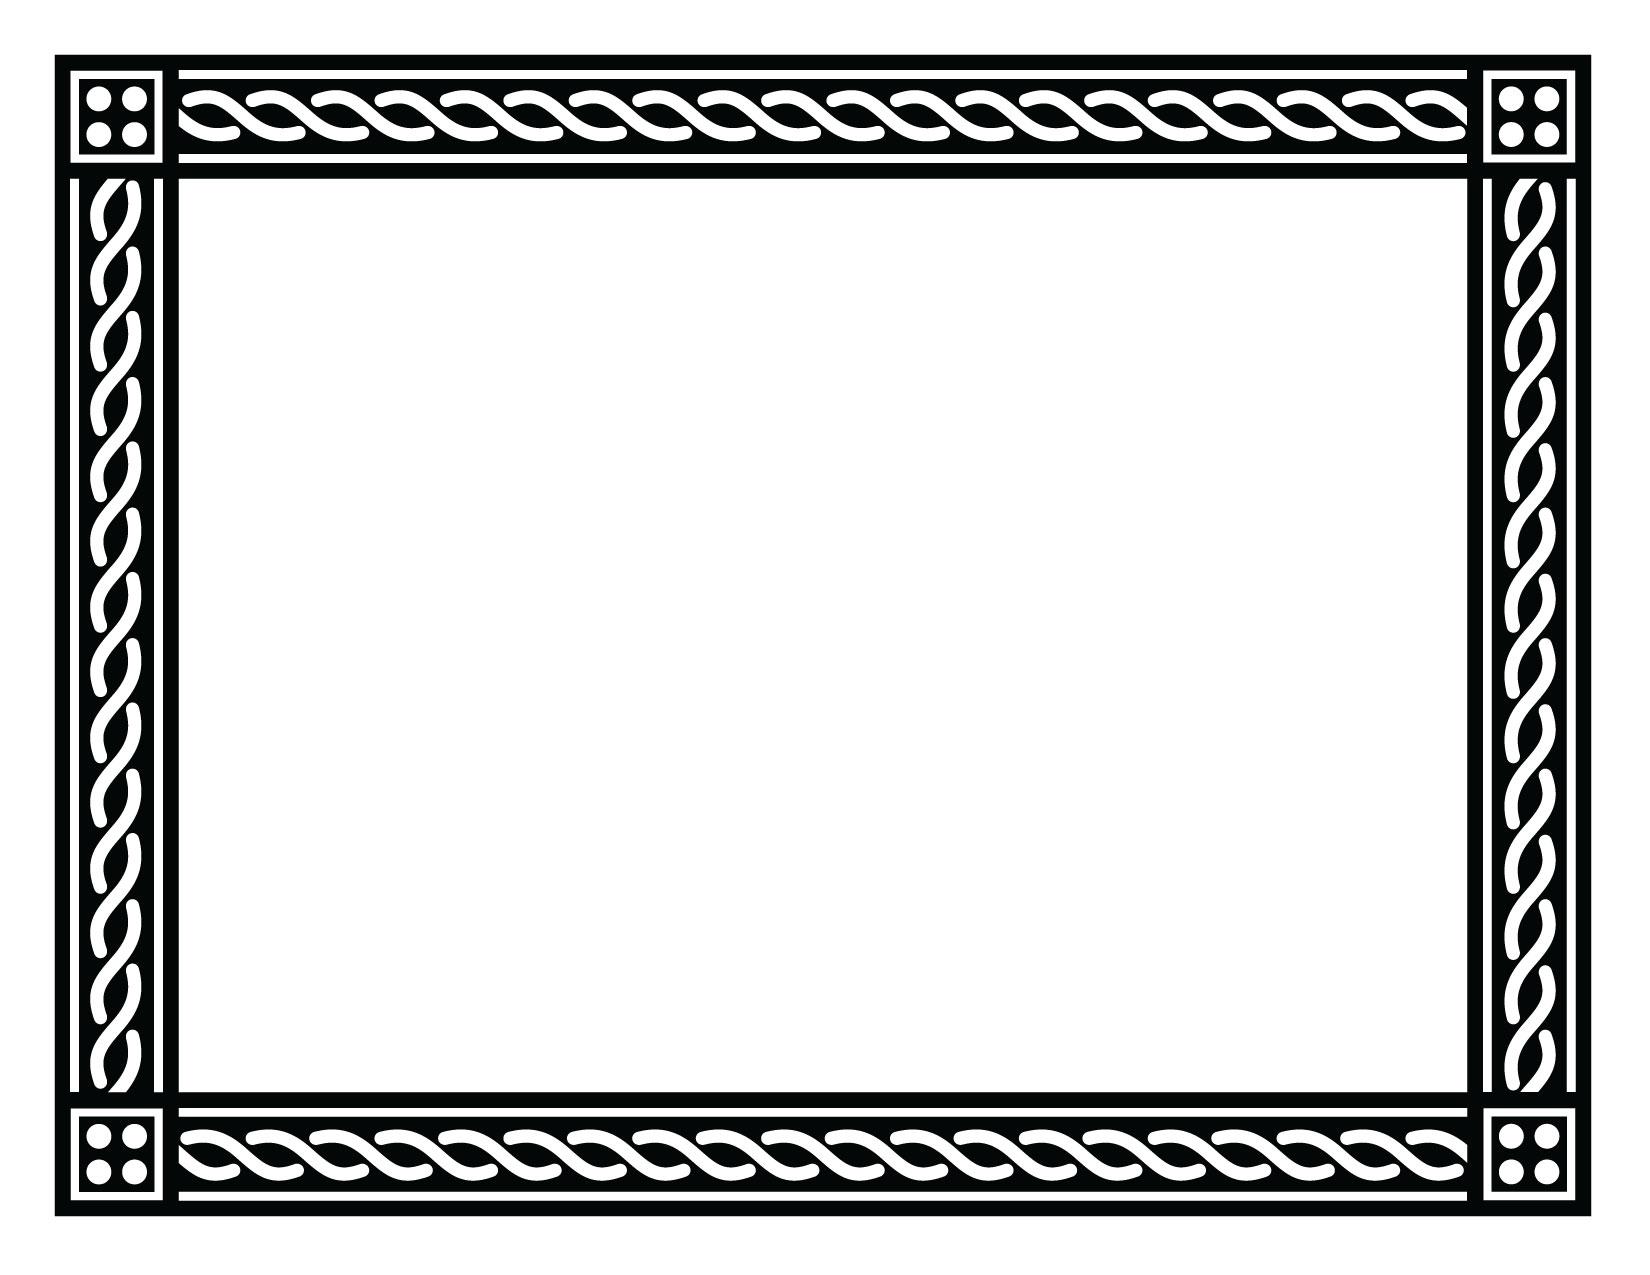 Amazoncom  Foil Certificate Paper Ornate Silver  Blank